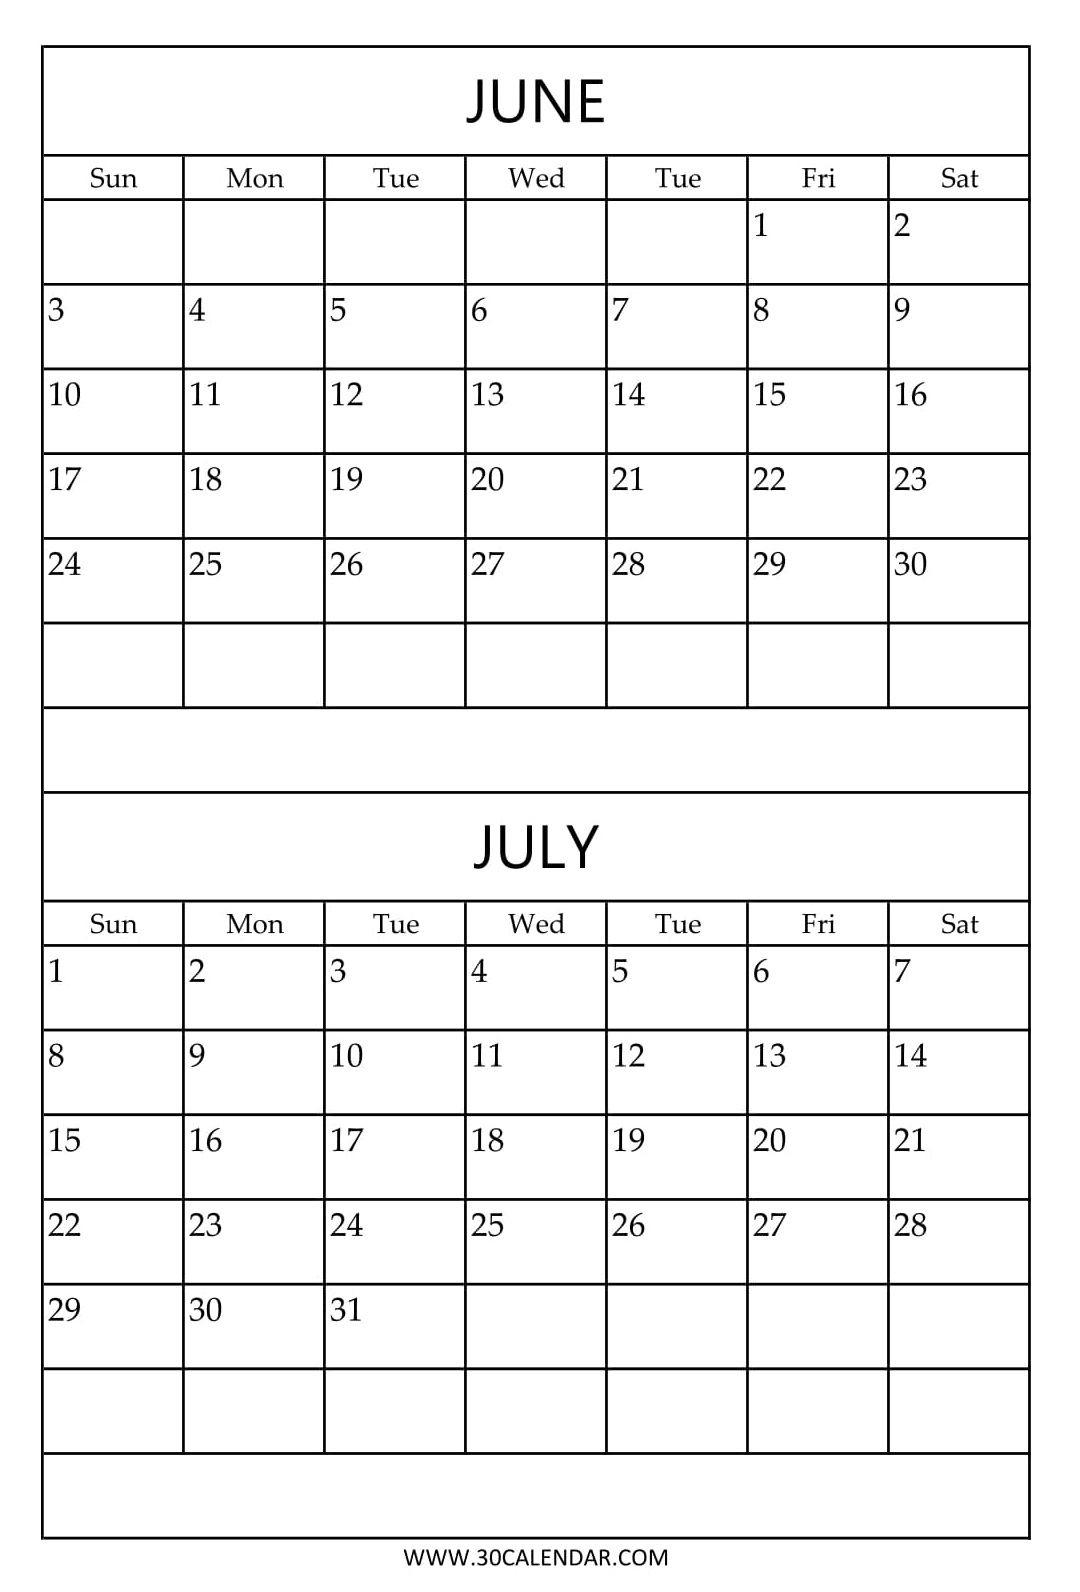 Free Printable June July Calendar Template | 2018 Calendar | July for Printable June And July Calendar